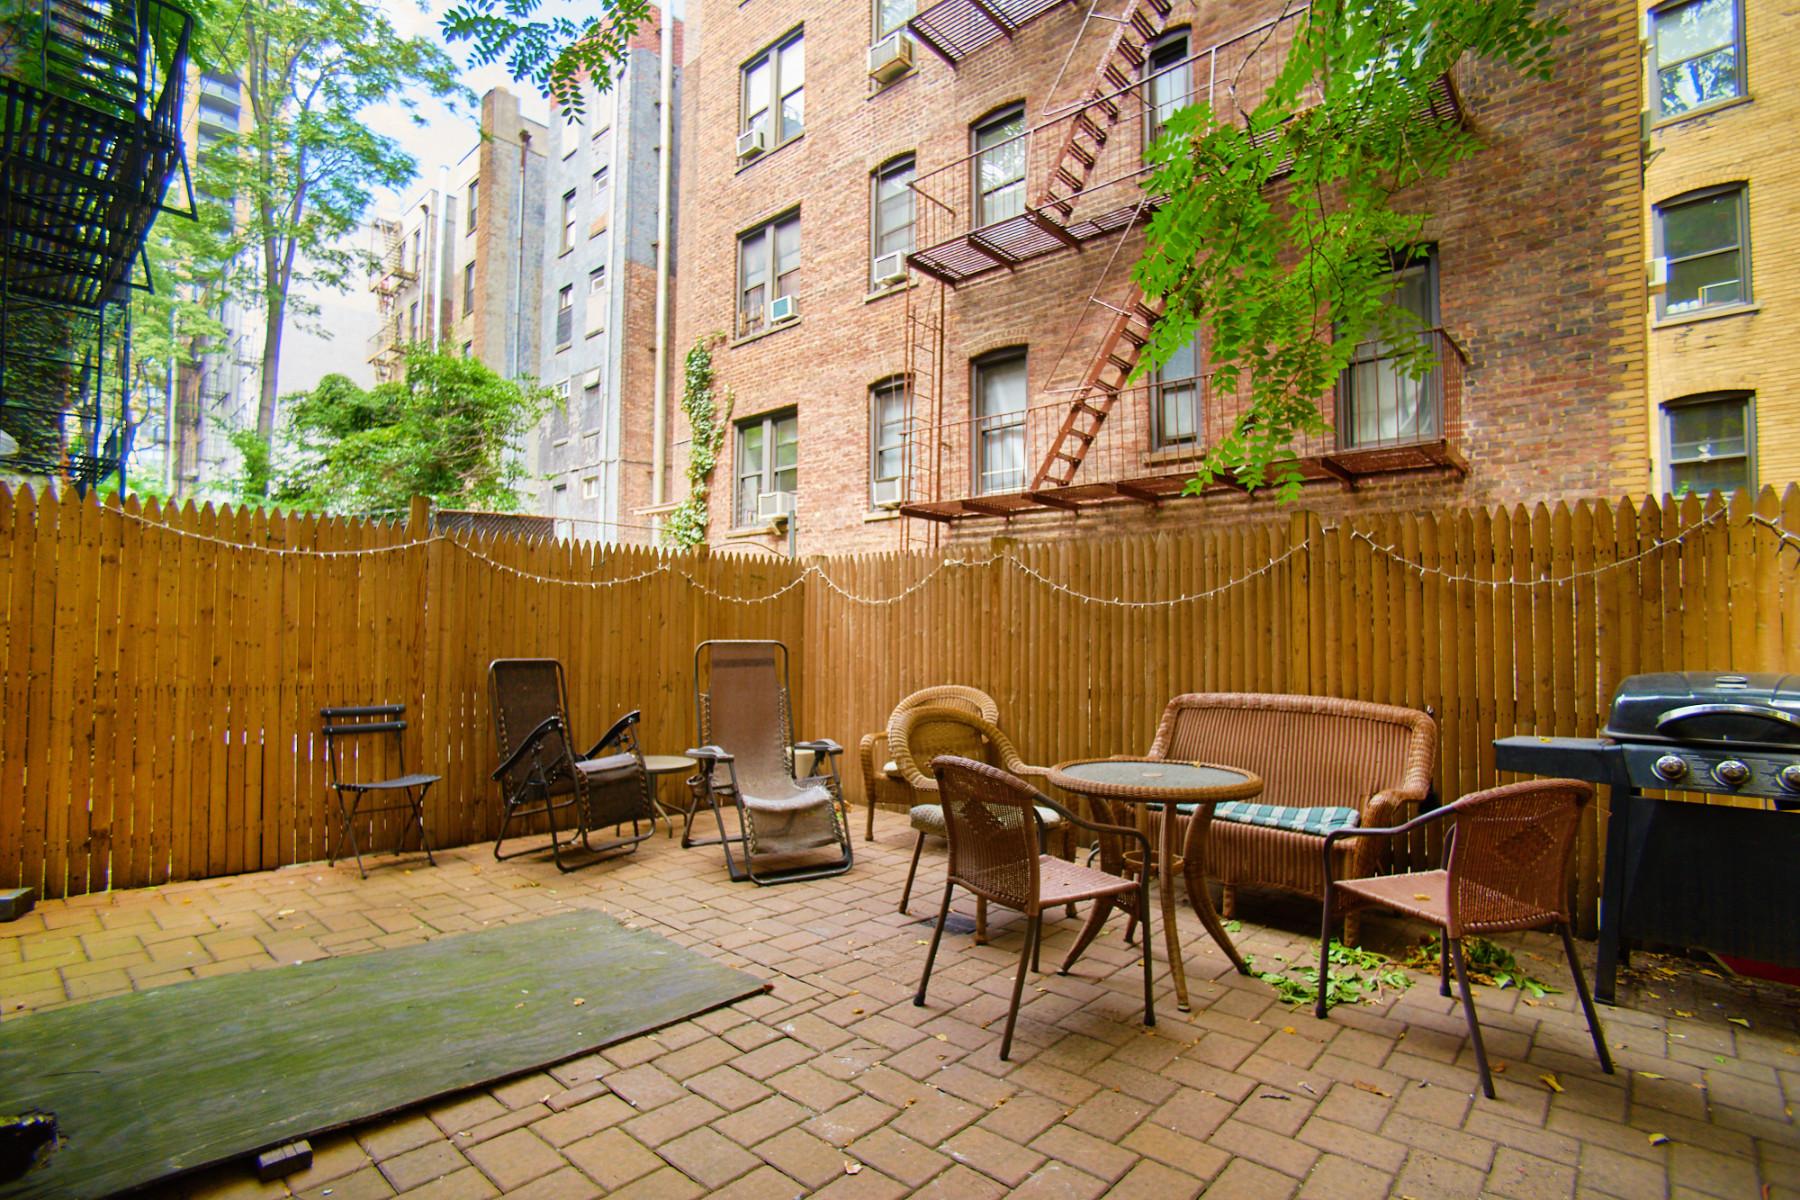 325 East 83rd Street, Apt 1CD, Manhattan, New York 10028